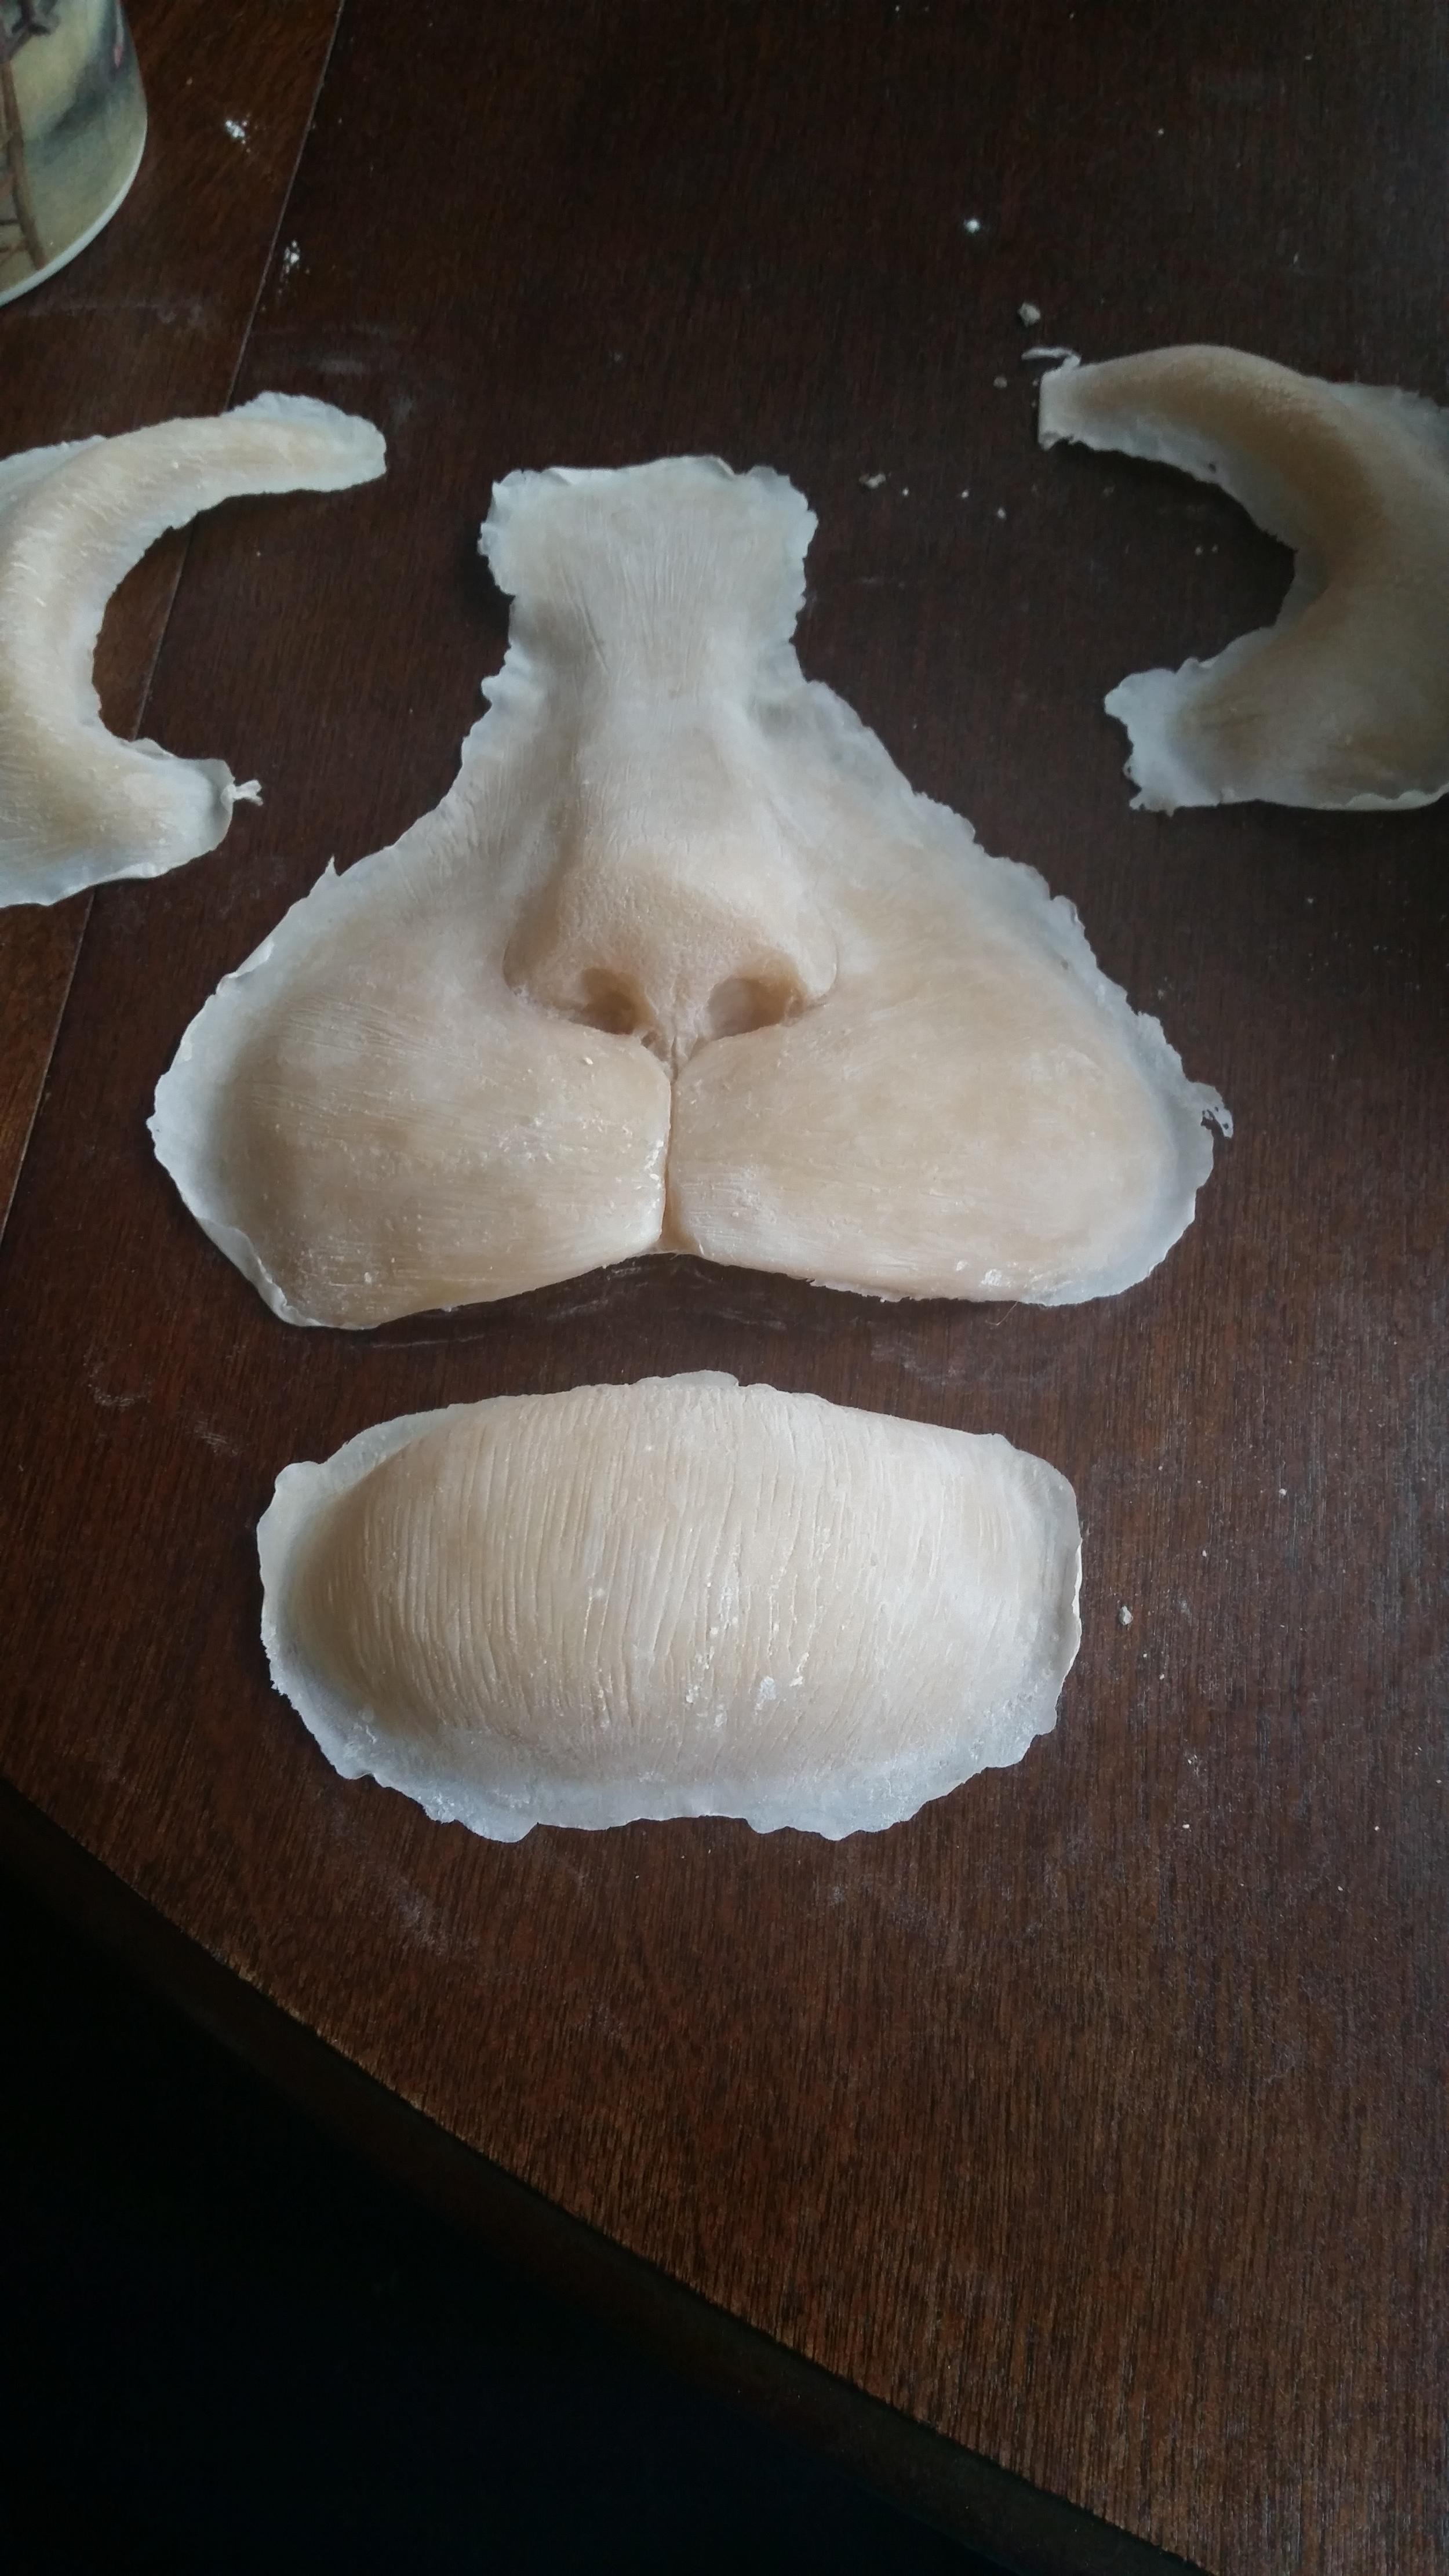 preliminary prosthetics